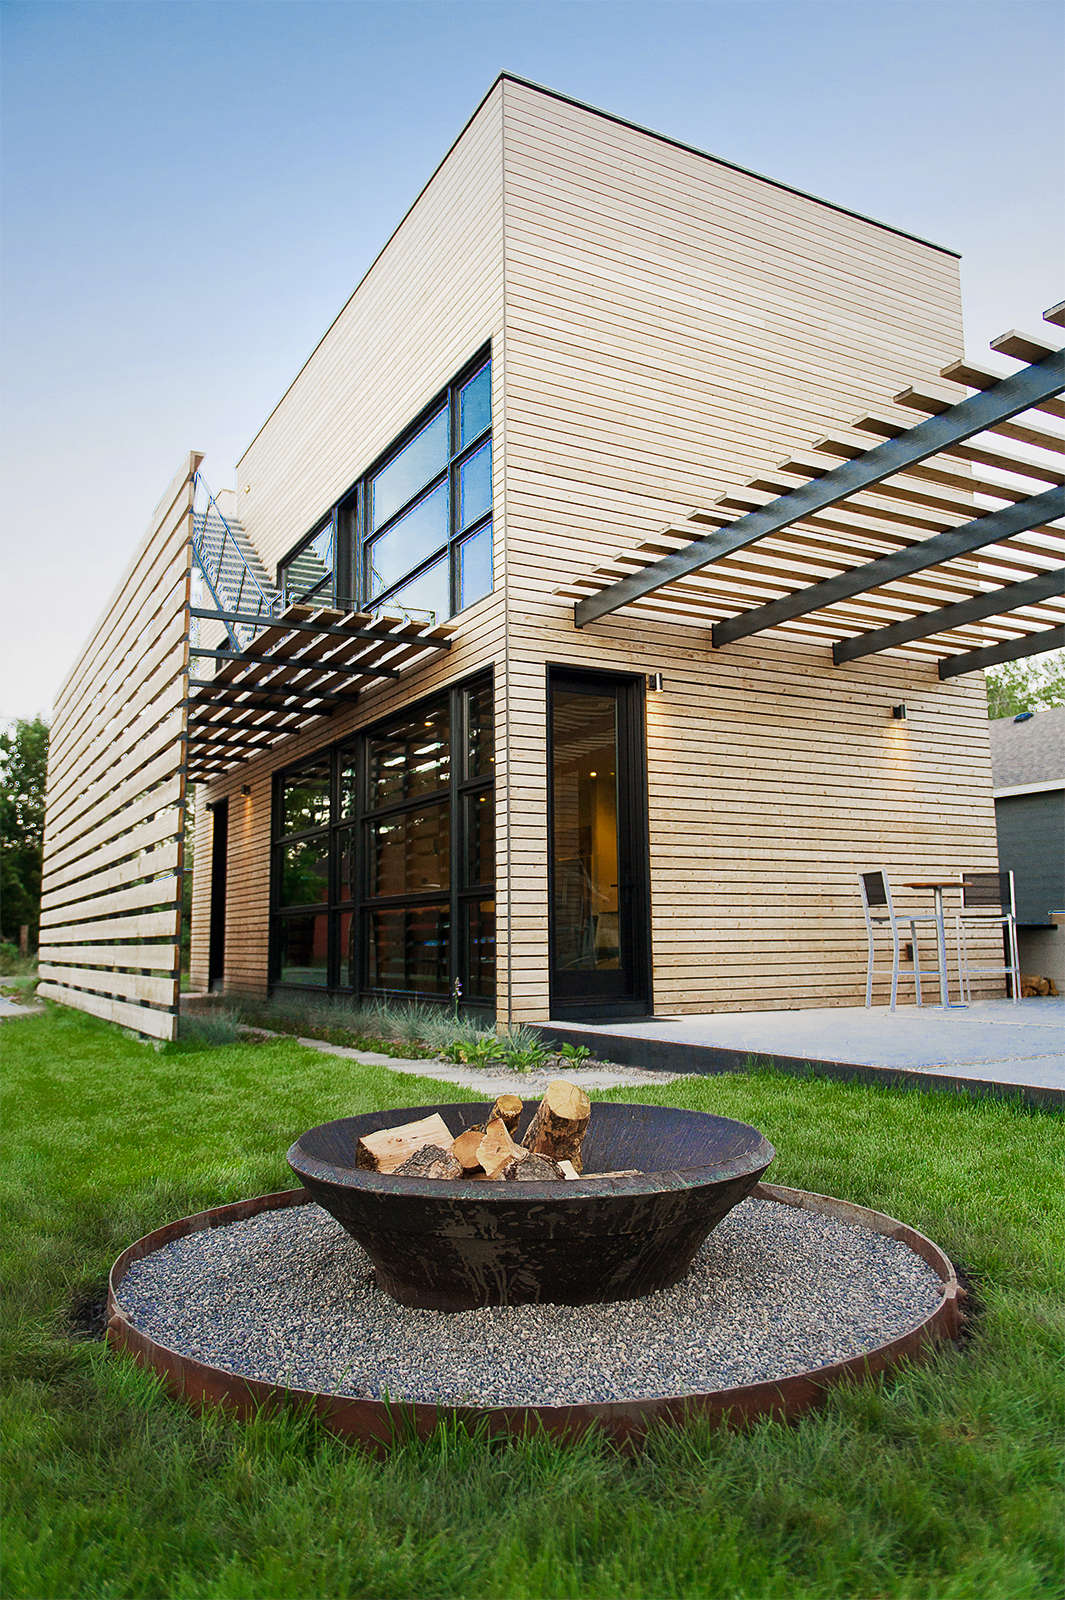 Woodworks-West-Bozeman-Montana-Builder-Cabinetry-Remodel-New-Construction--2-2.jpg